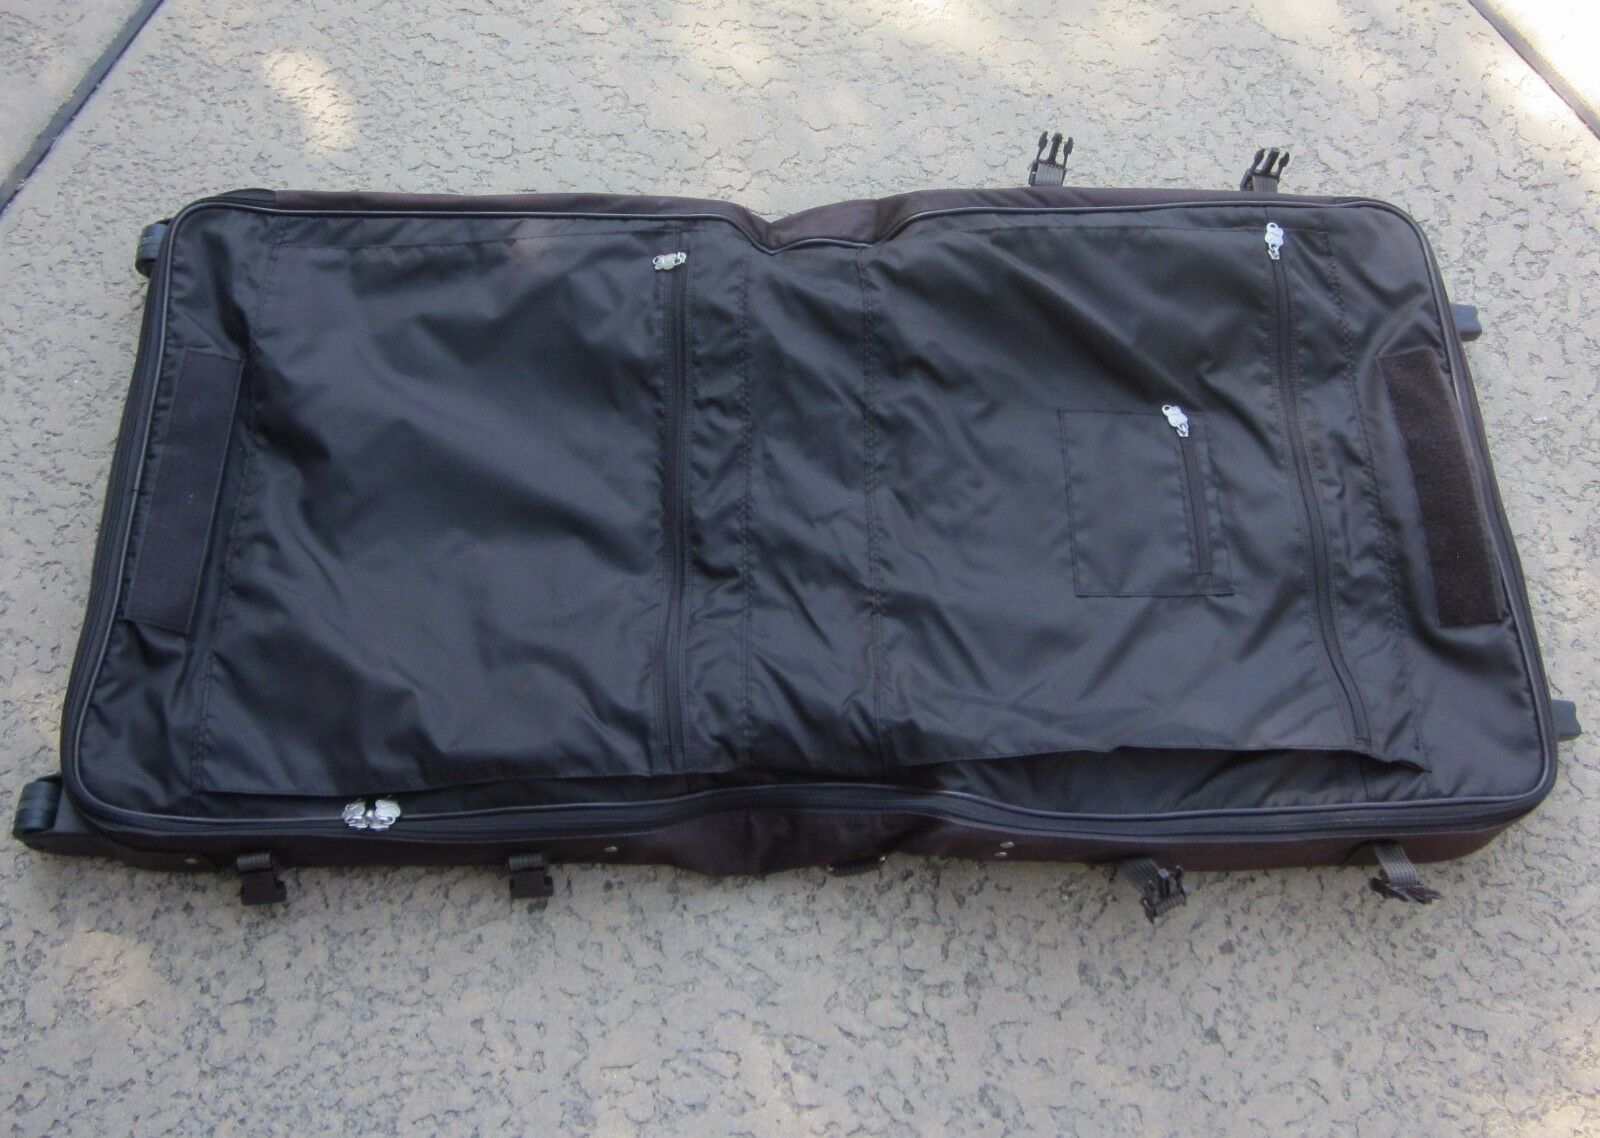 Skyway Luggage Sigma 3 Bifold Garment Bag   Skyway luggage  Skyway Wheeled Garment Bags